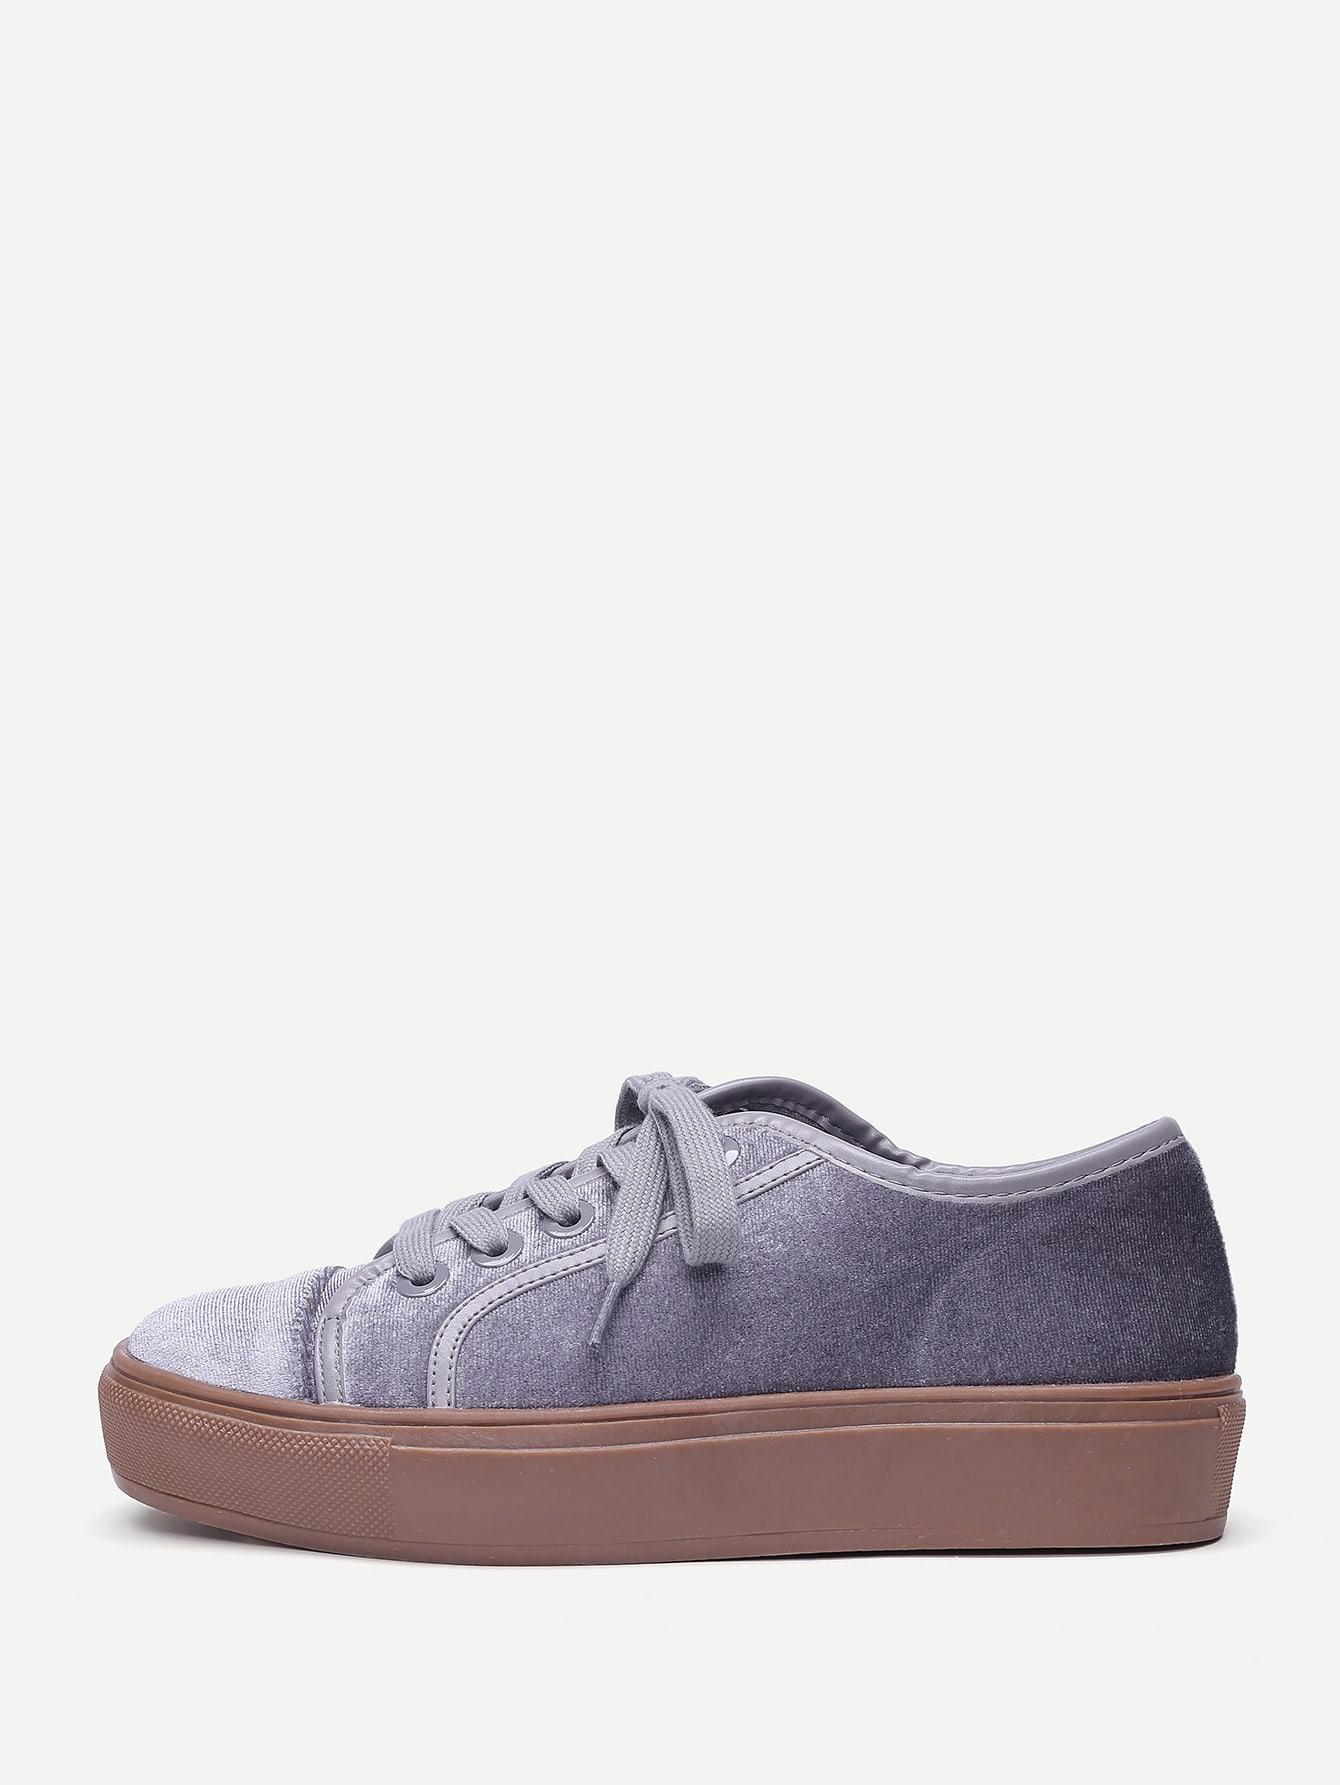 Lace Up Flatform Velvet Sneakers lace up flatform satin shoes